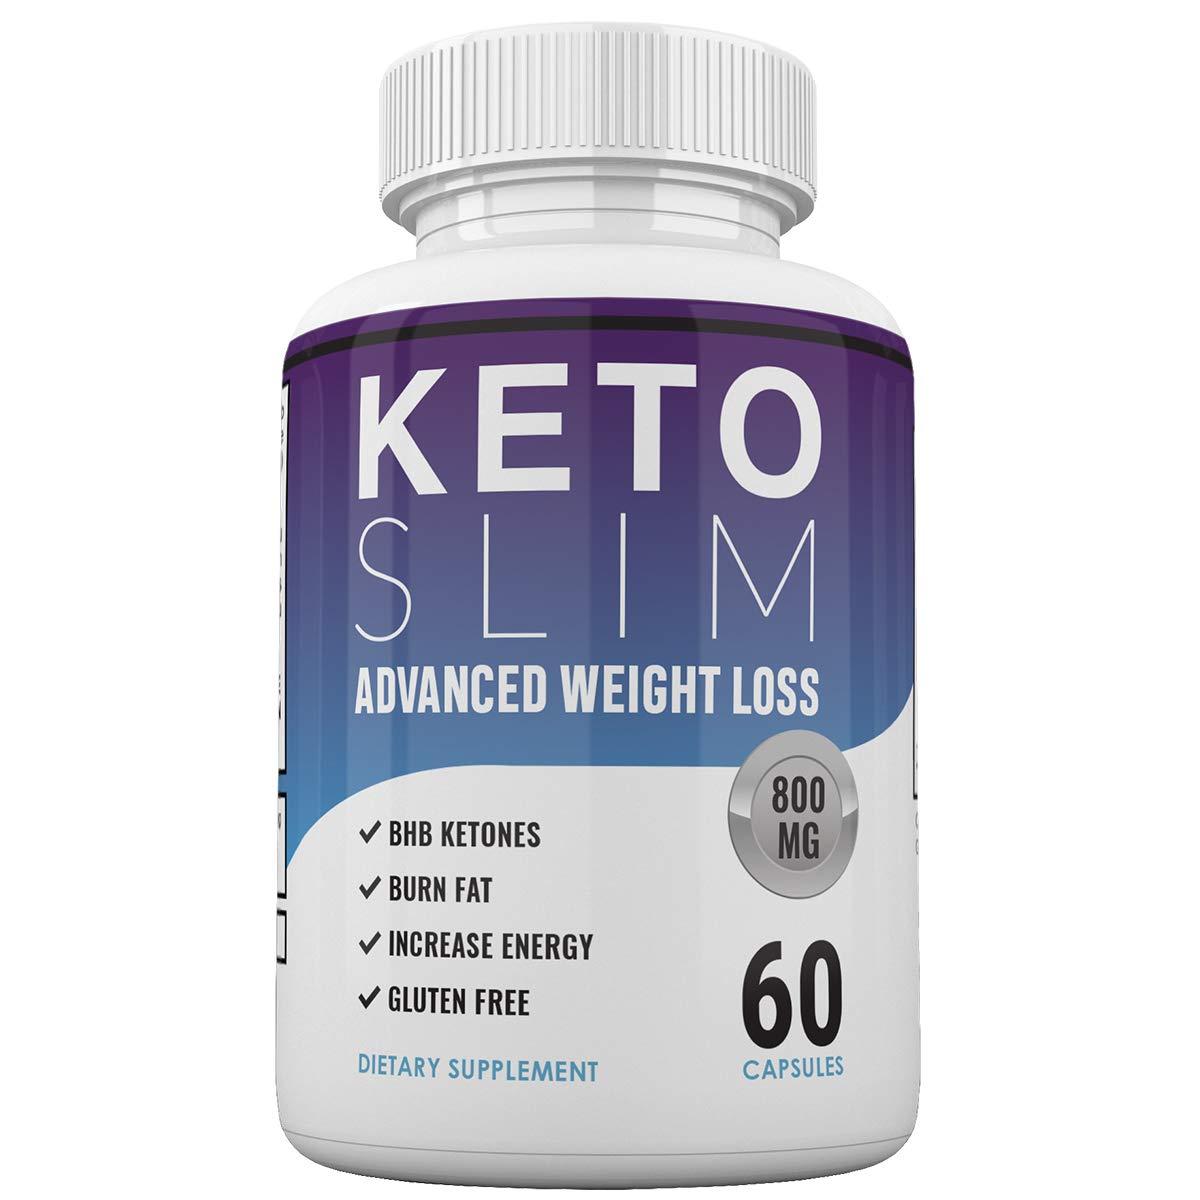 Keto Slim Advanced Weight Loss - Burn Fat Fast for Energy Hack - Beta BHB - Gluten Free - 30 Day Supply - 60 Capsules by Keto Slim Advanced